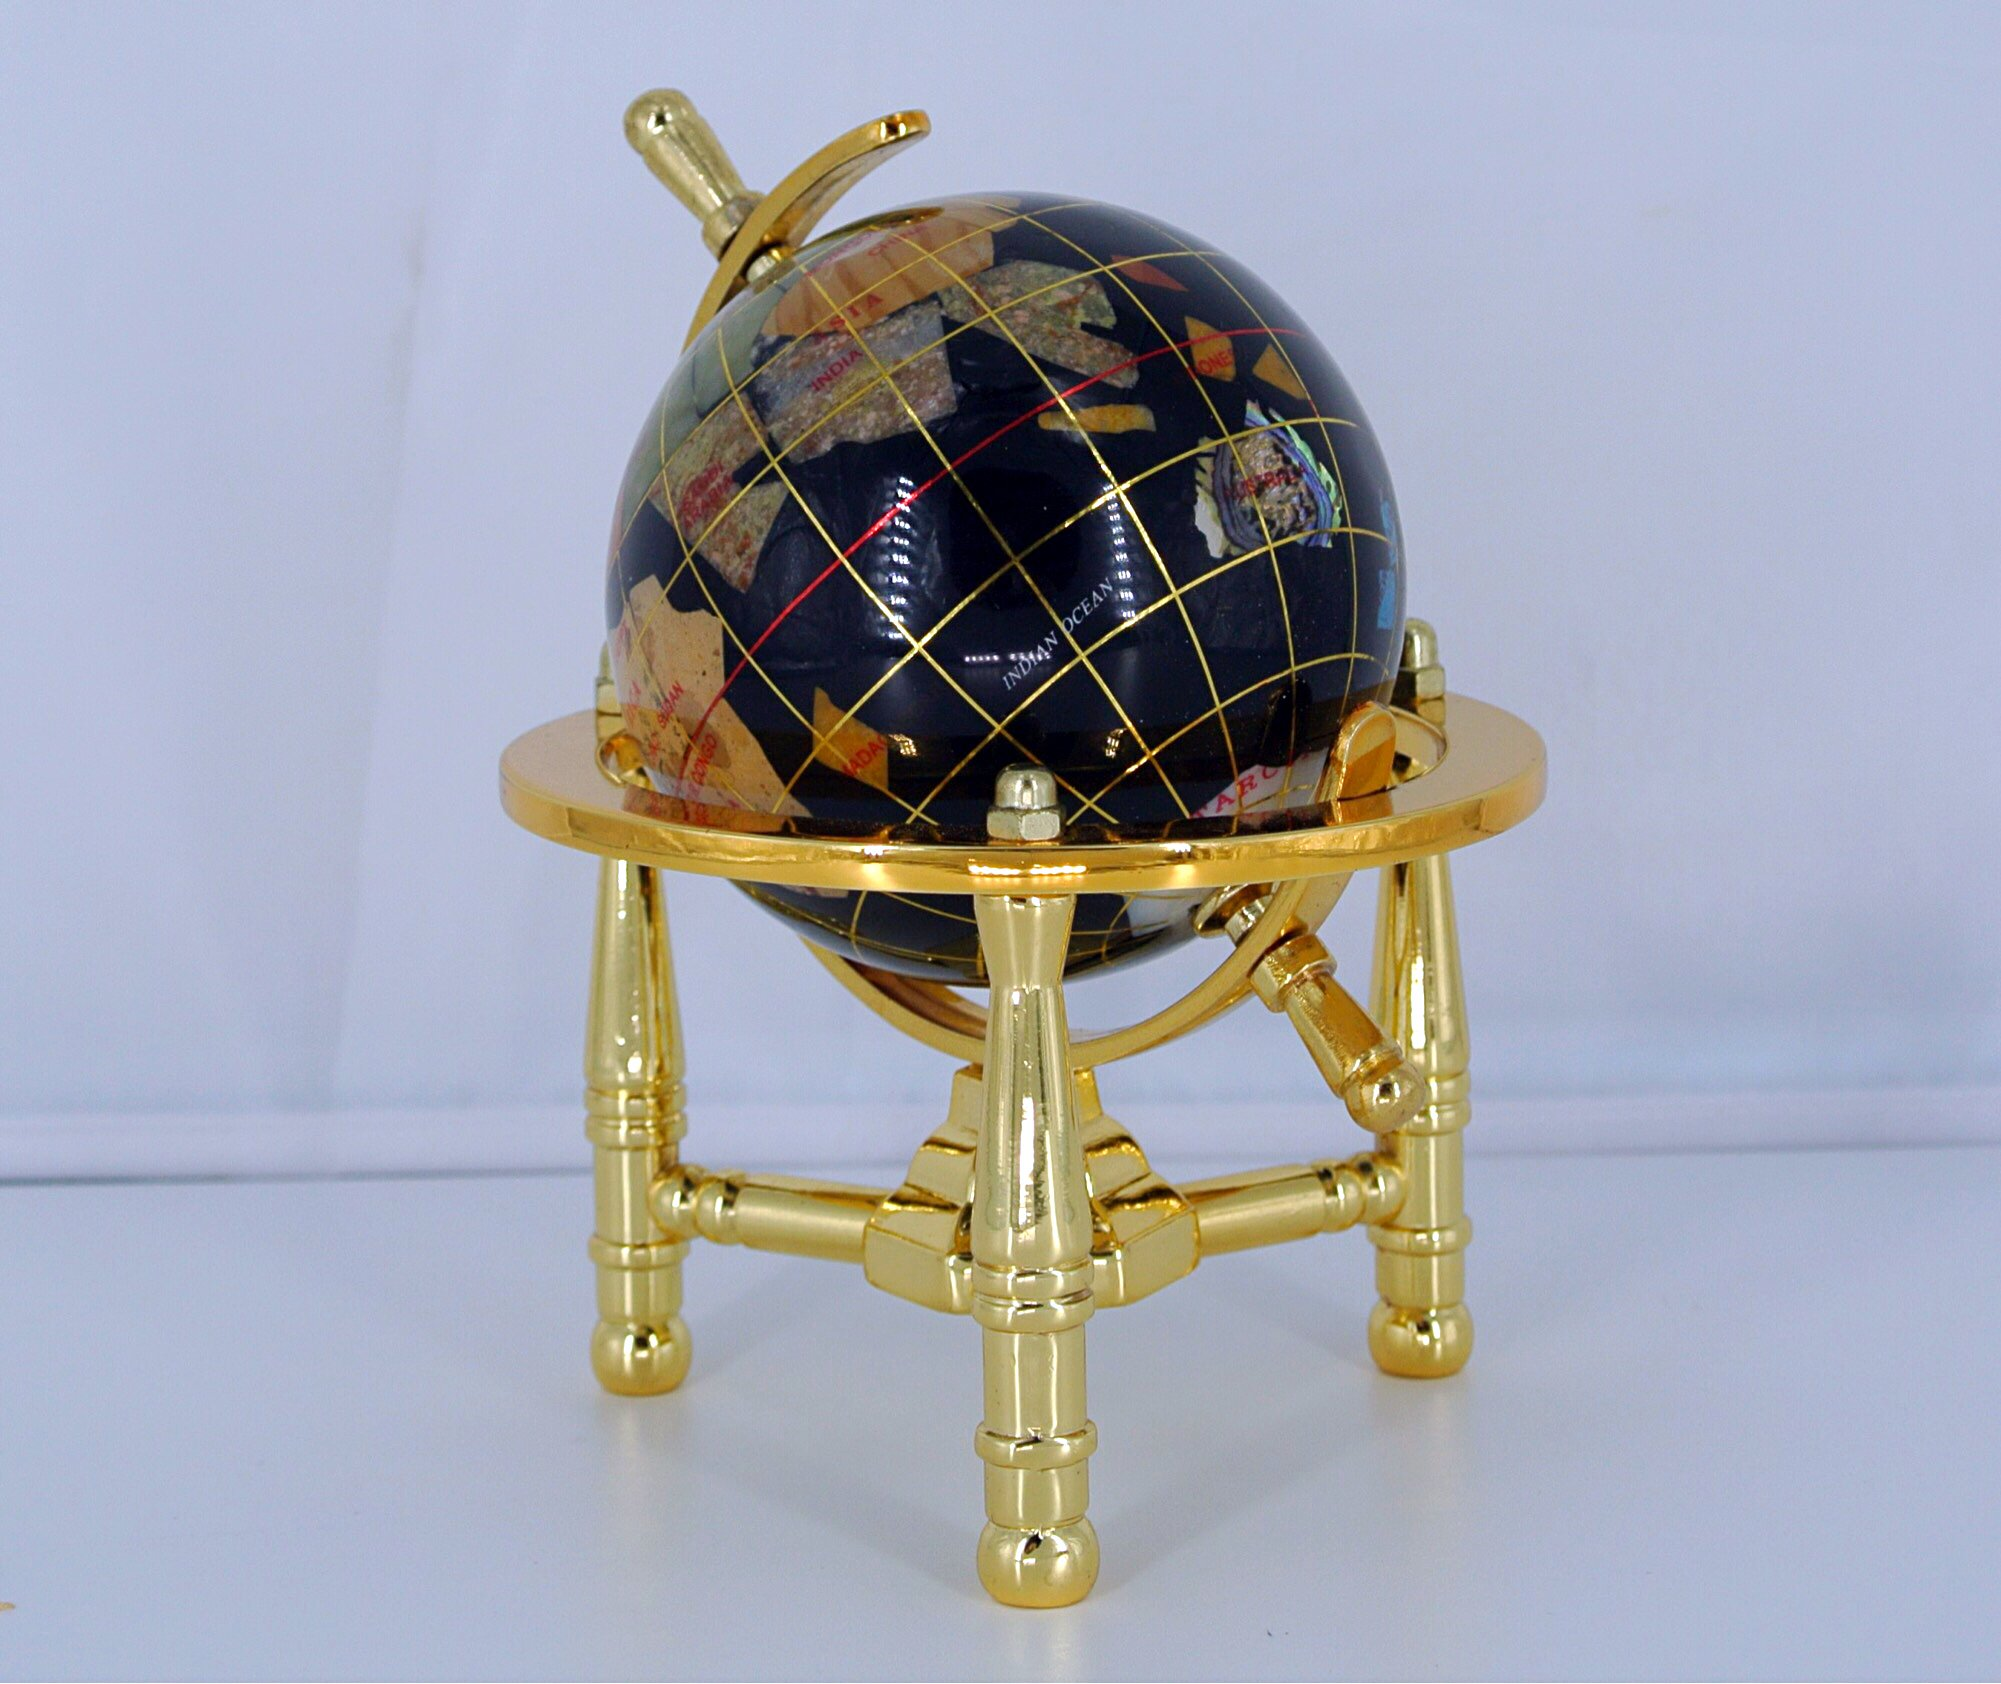 Unique Art 6-Inch by Black Onyx Ocean Mini Table Top Gemstone World Globe with Gold Tripod